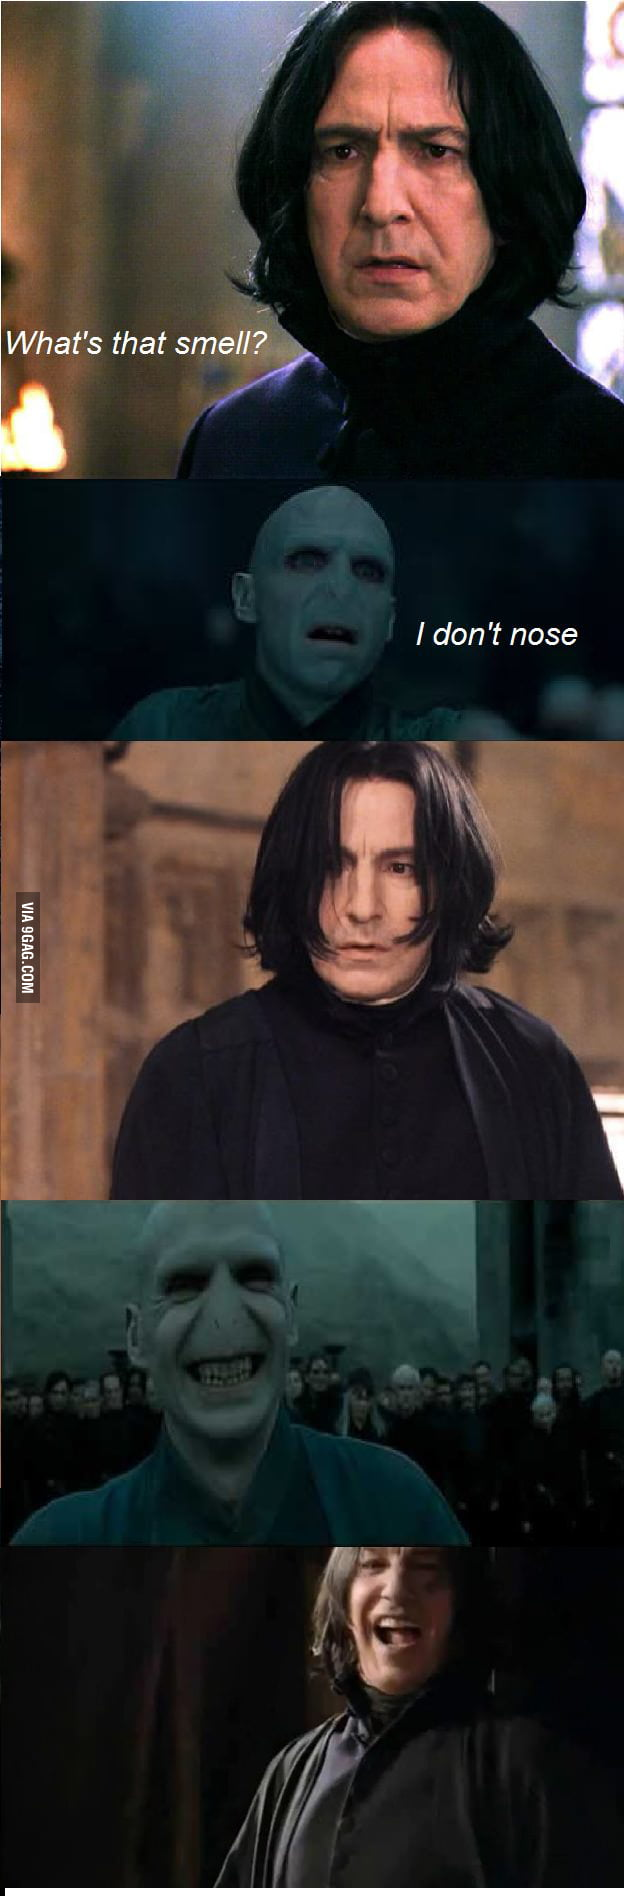 Voldemort, funny guy!